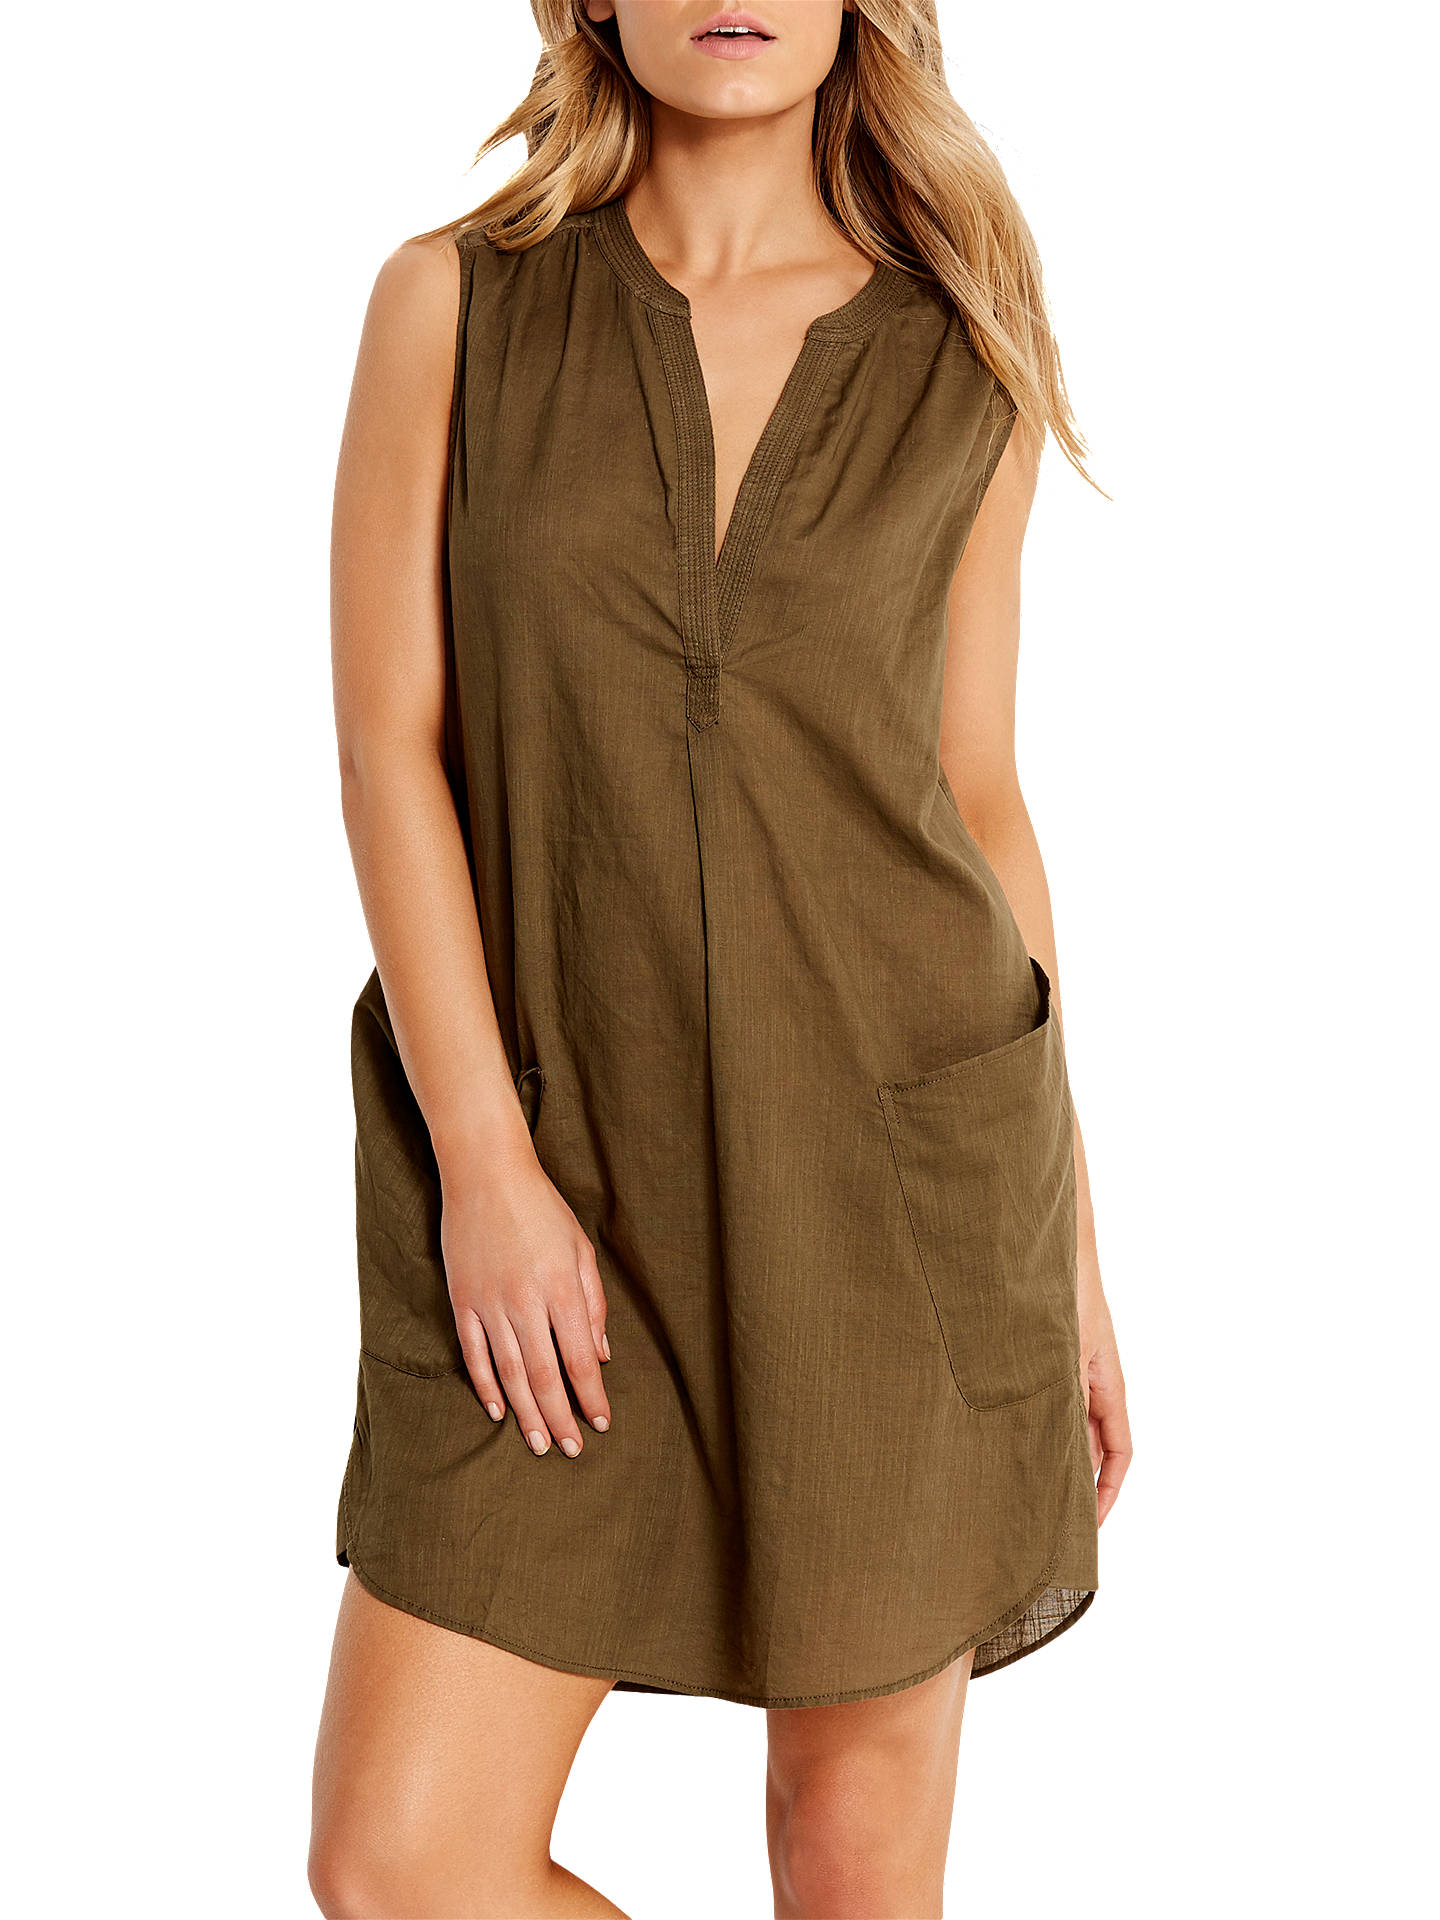 68a9902ed4 Buy Seafolly Sleeveless Boyfriend Beach Shirt, Dark Olive, S Online at  johnlewis.com ...